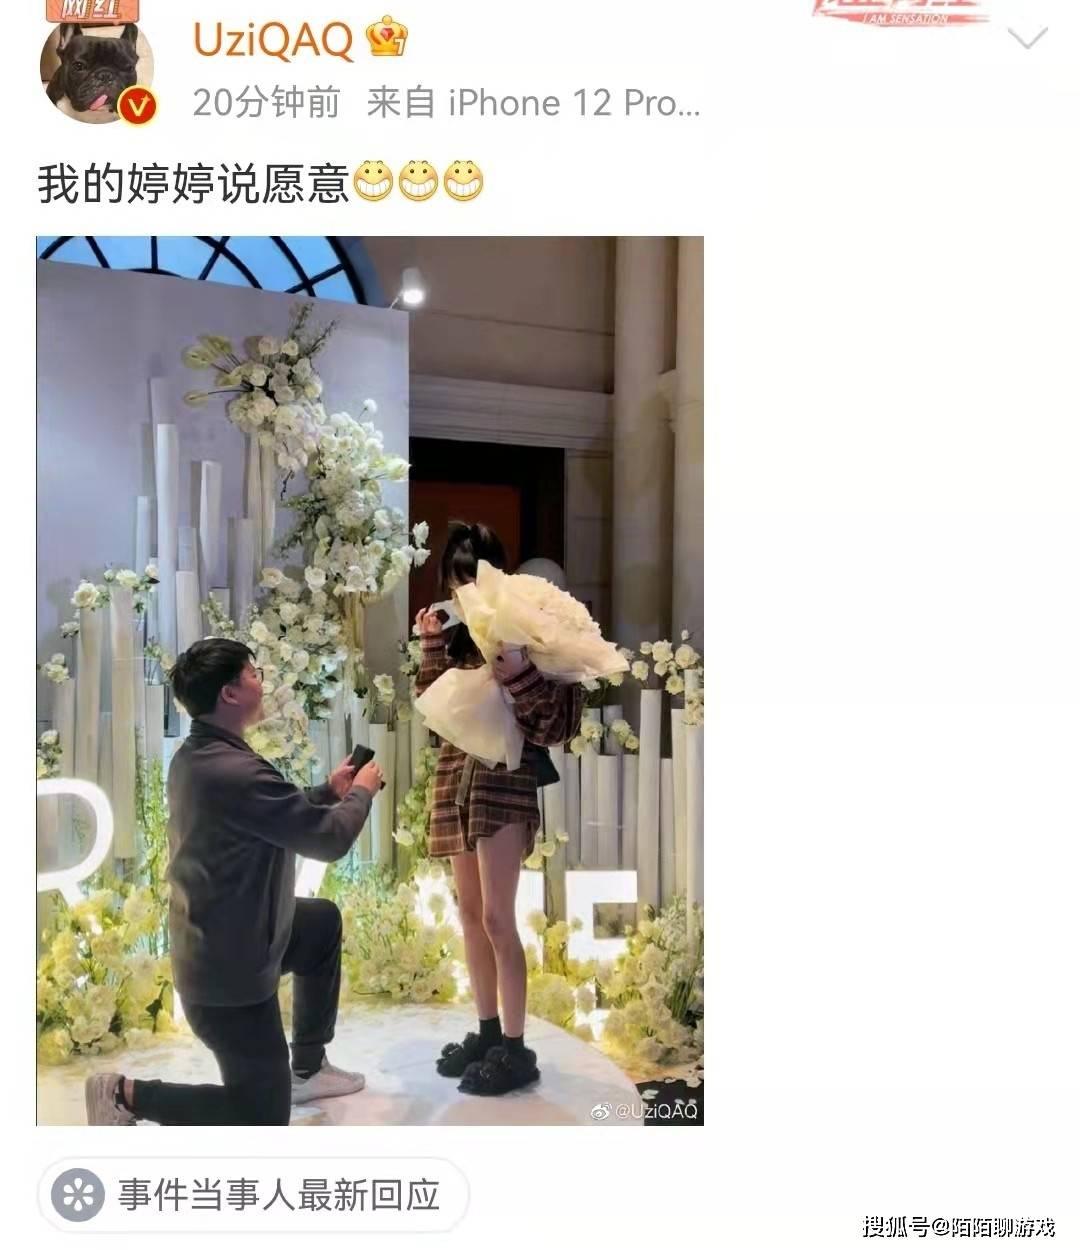 UZI鸽了直播,干了一件大事,终于向婷婷求婚了,粉丝:青春结束了